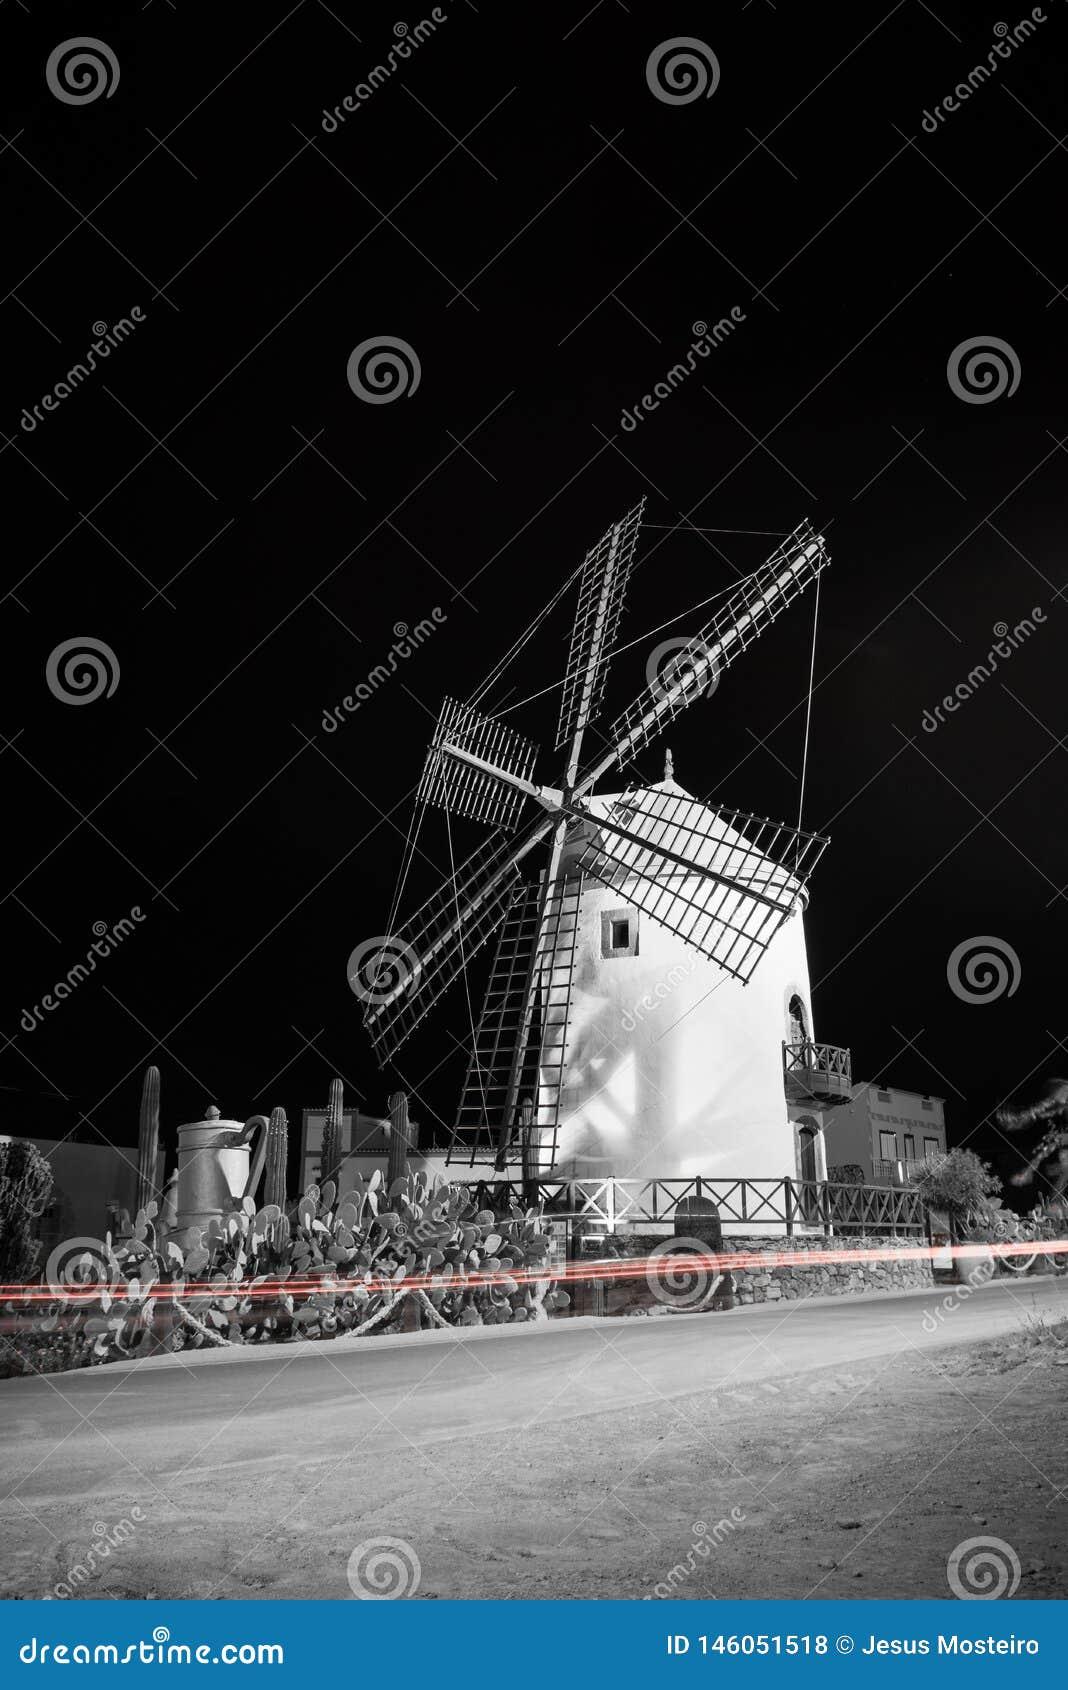 Old Windmill, village of Mogan, Gran Canaria, Spain